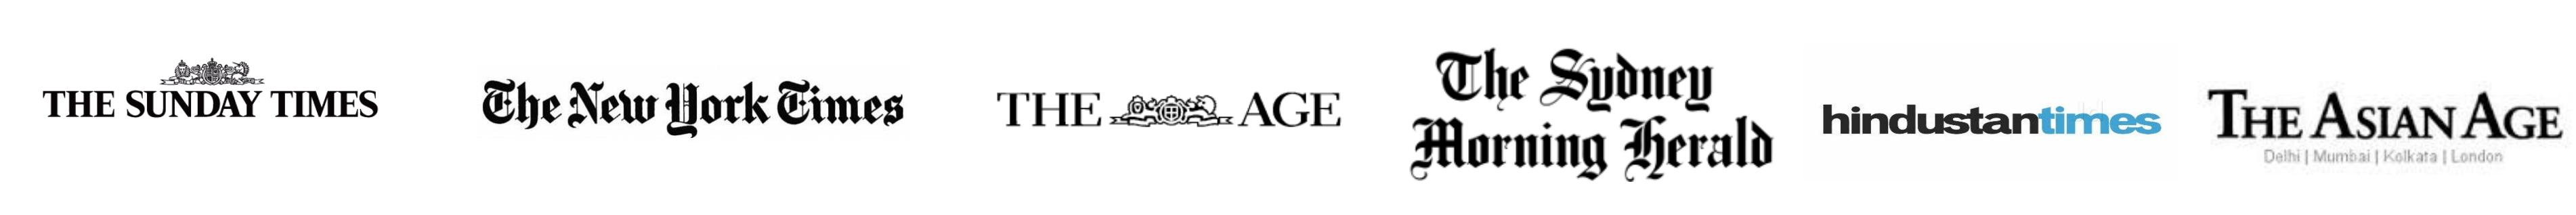 news logo banner